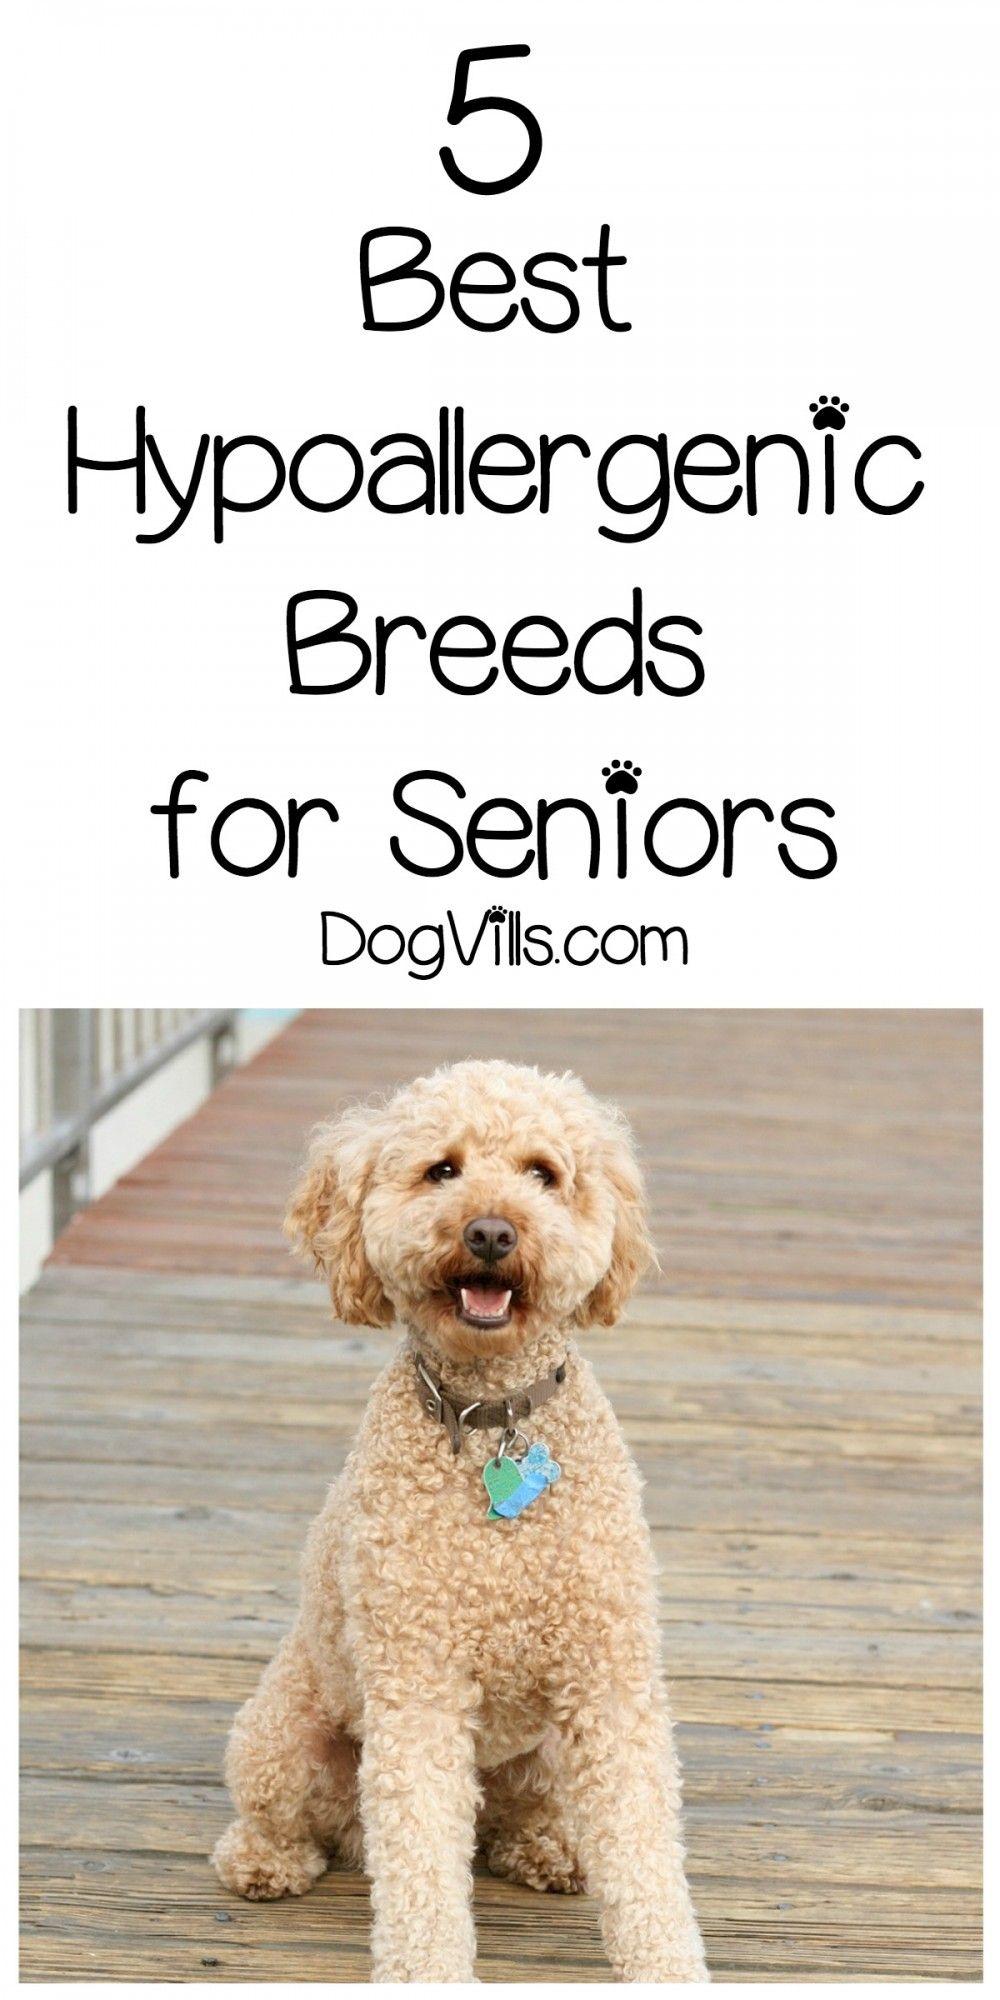 5 Best Hypoallergenic Breeds for Seniors Best